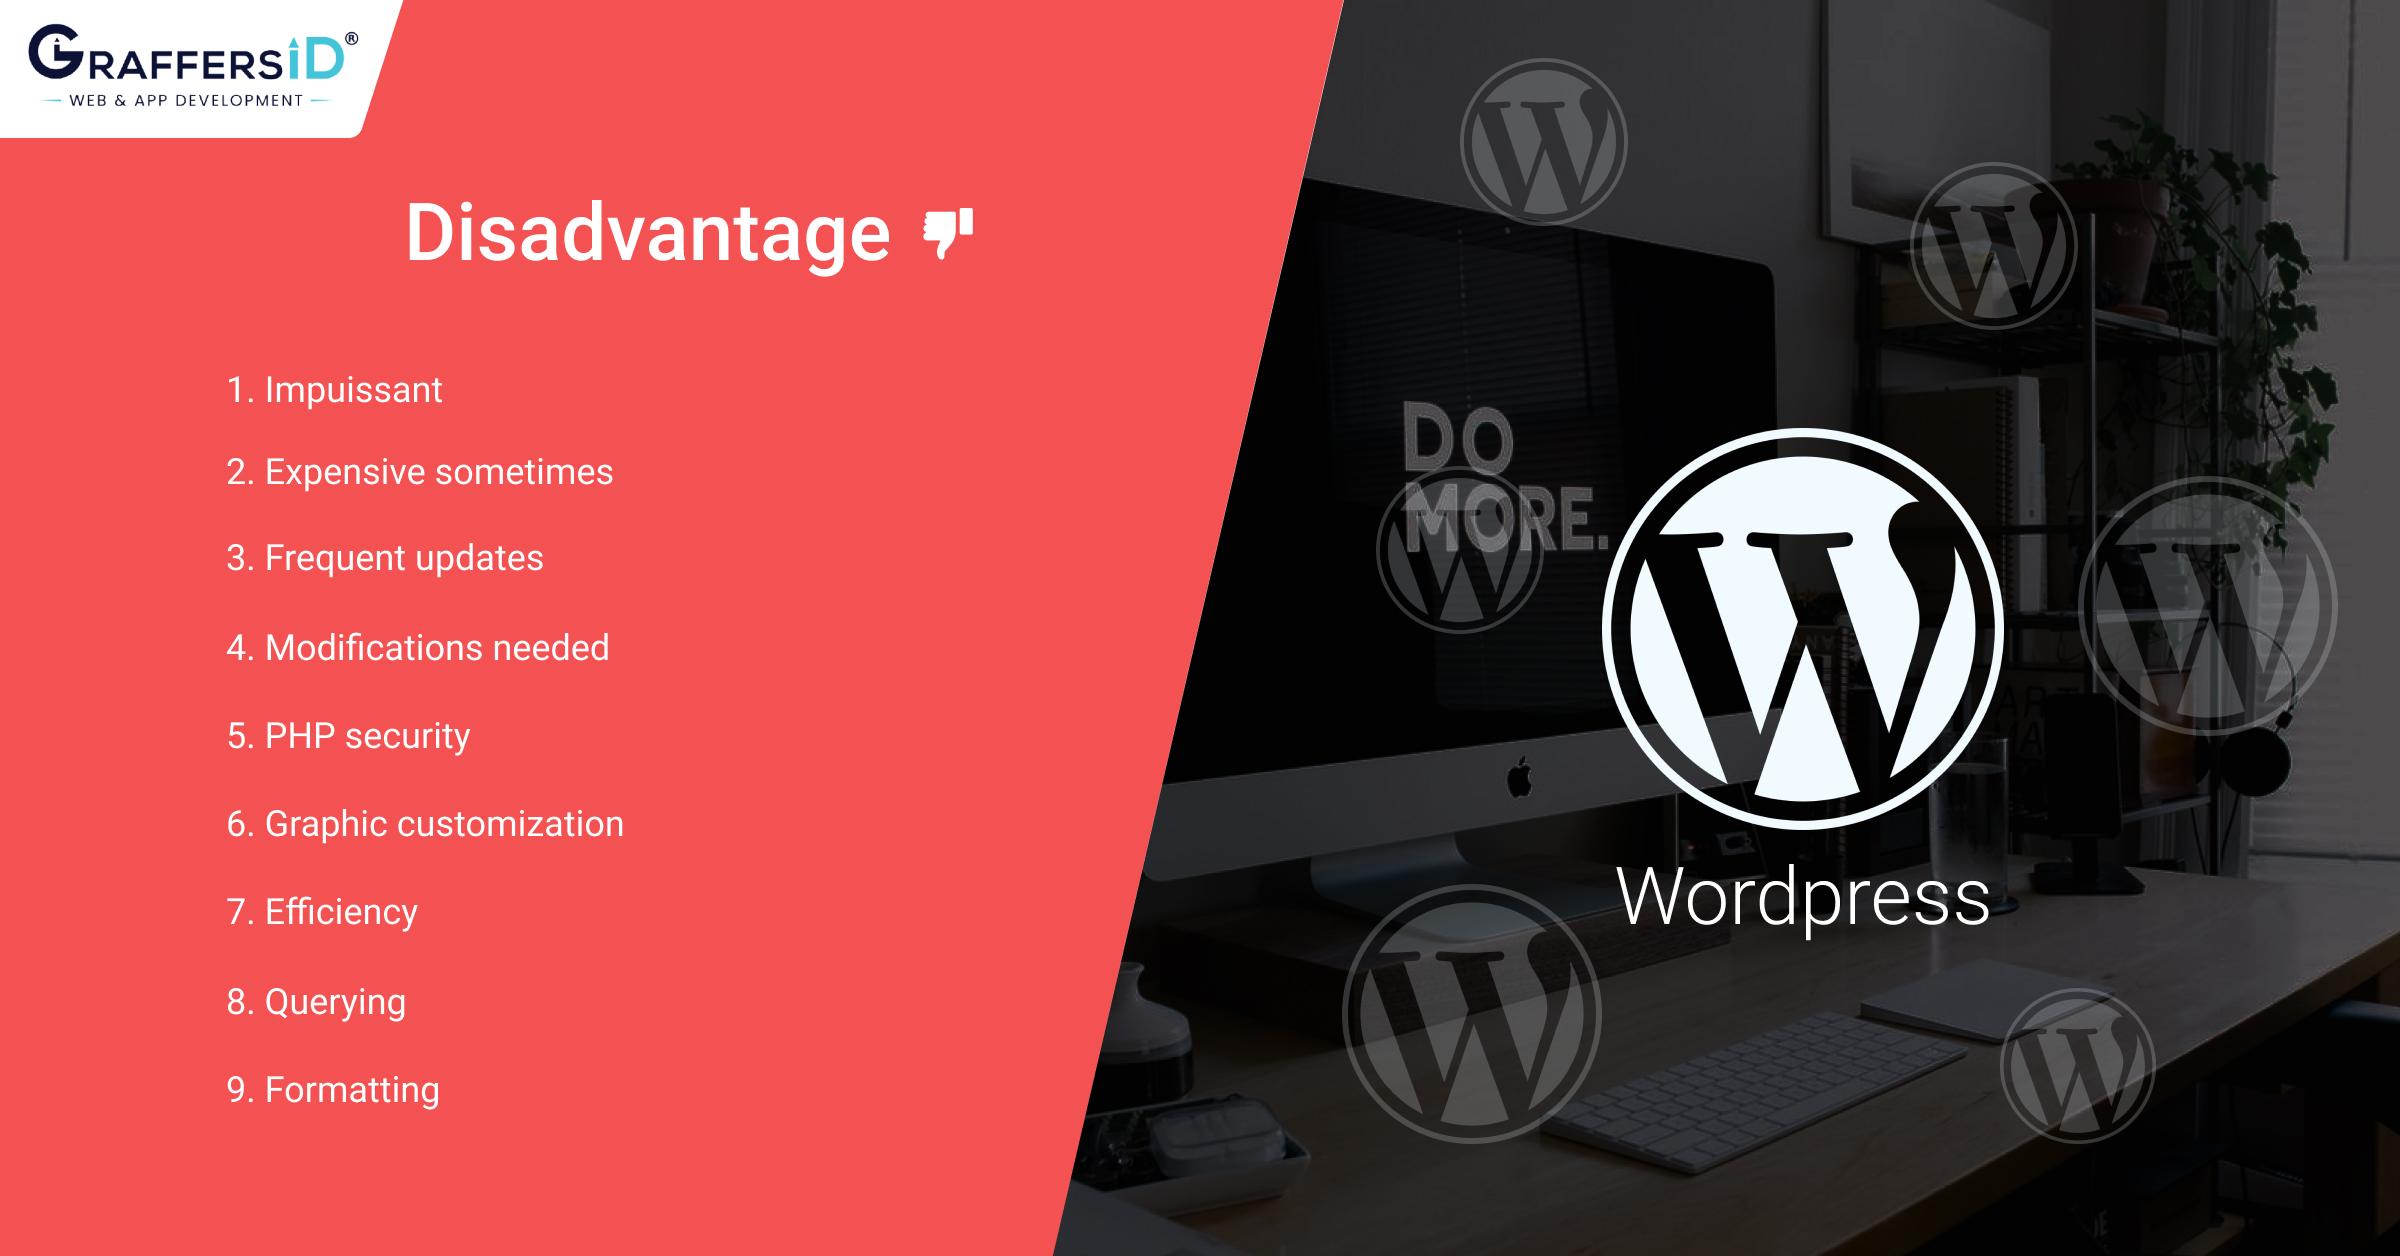 Disadvantages of WordPress website